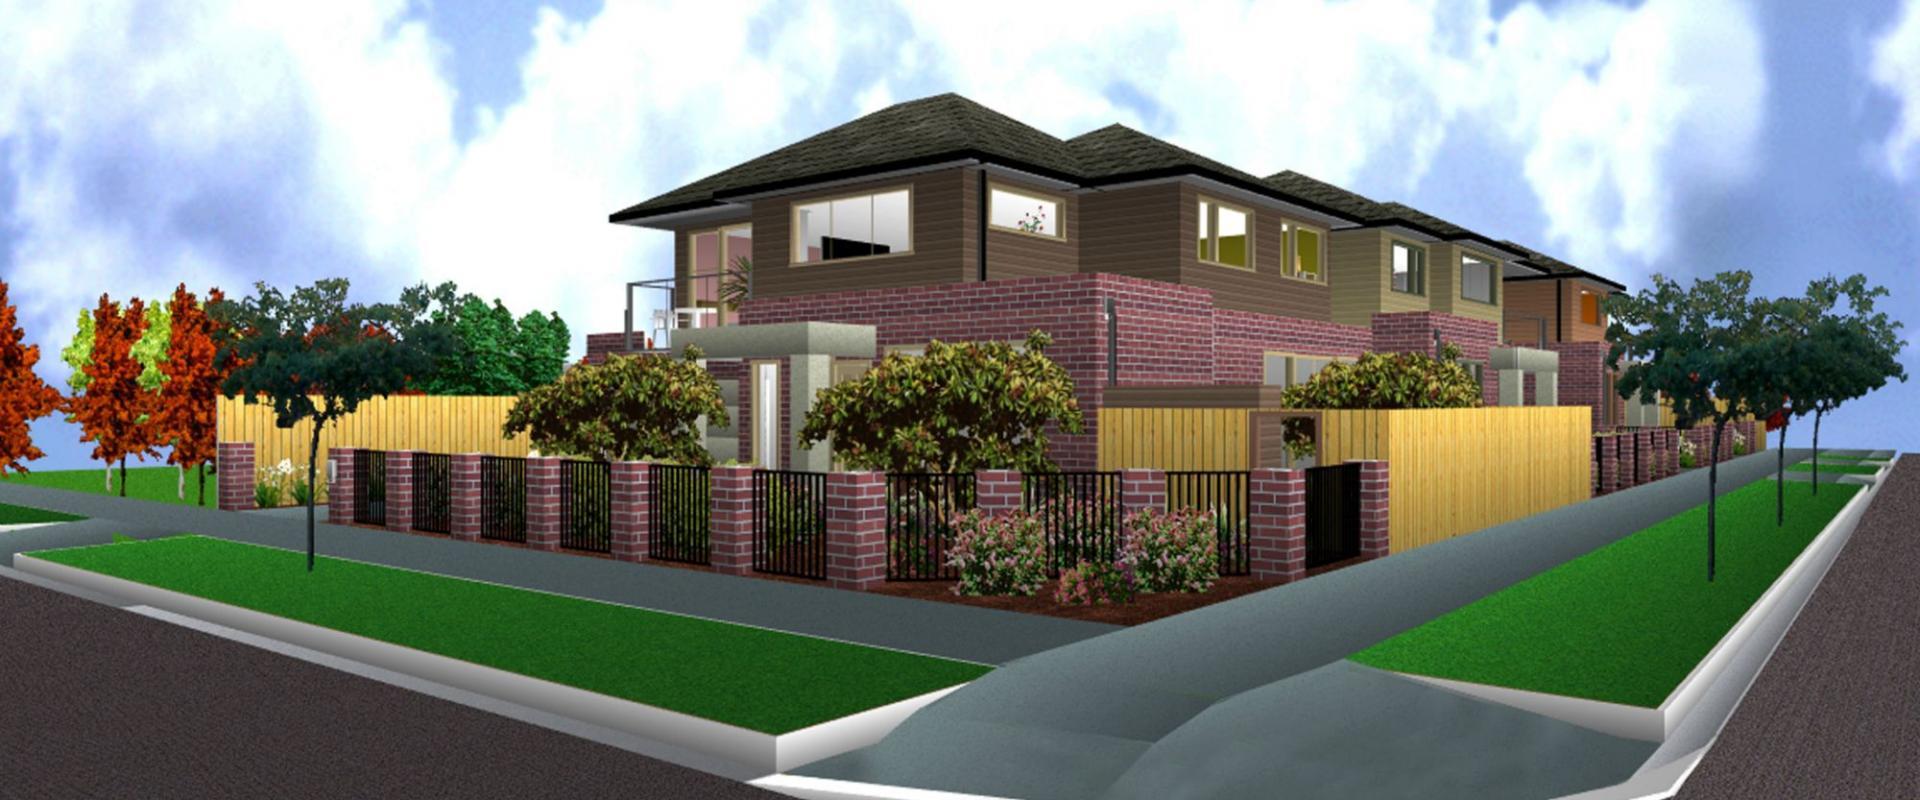 Weston Real Estate Melbourne - Prestige Development - For Sale Now ...